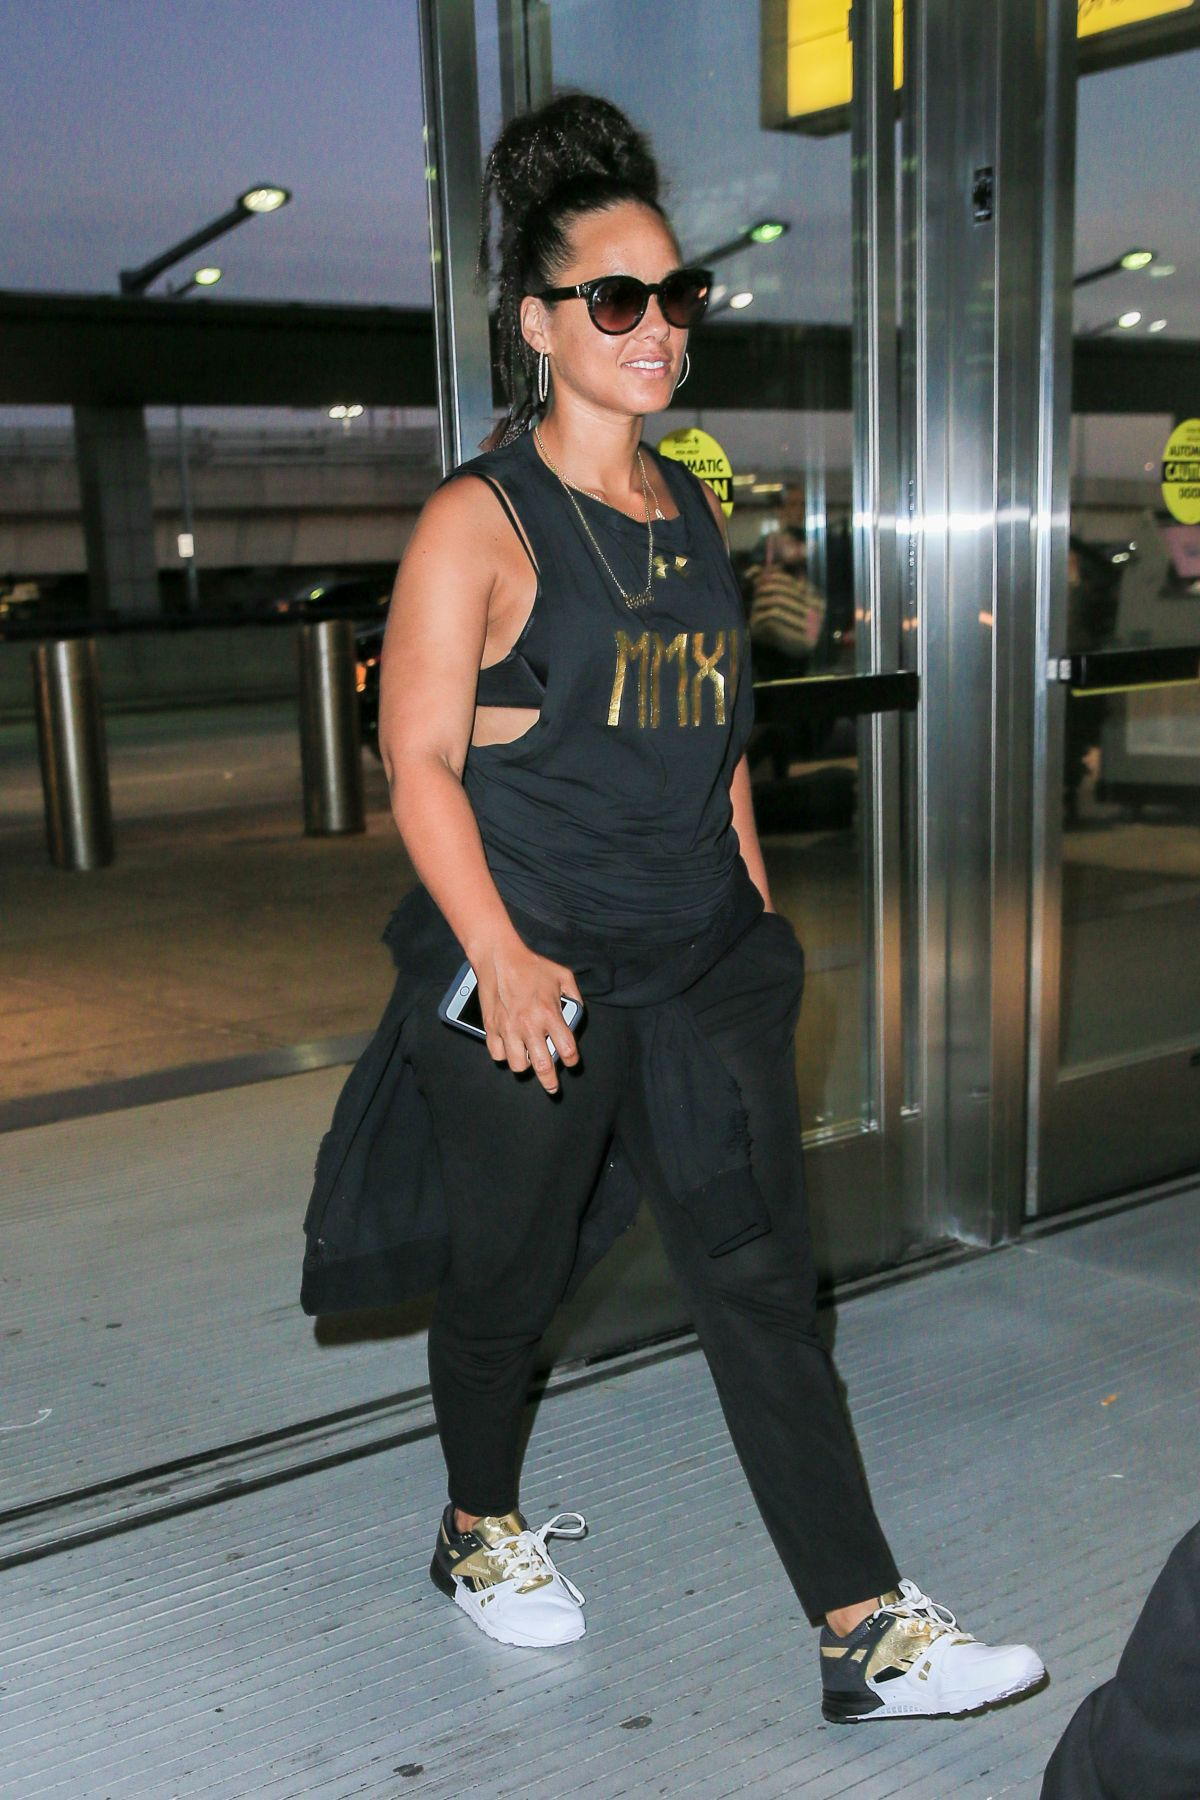 ALICIA KEYS at JFK Airport in New York 08/29/2016 ... Alicia Keys New York